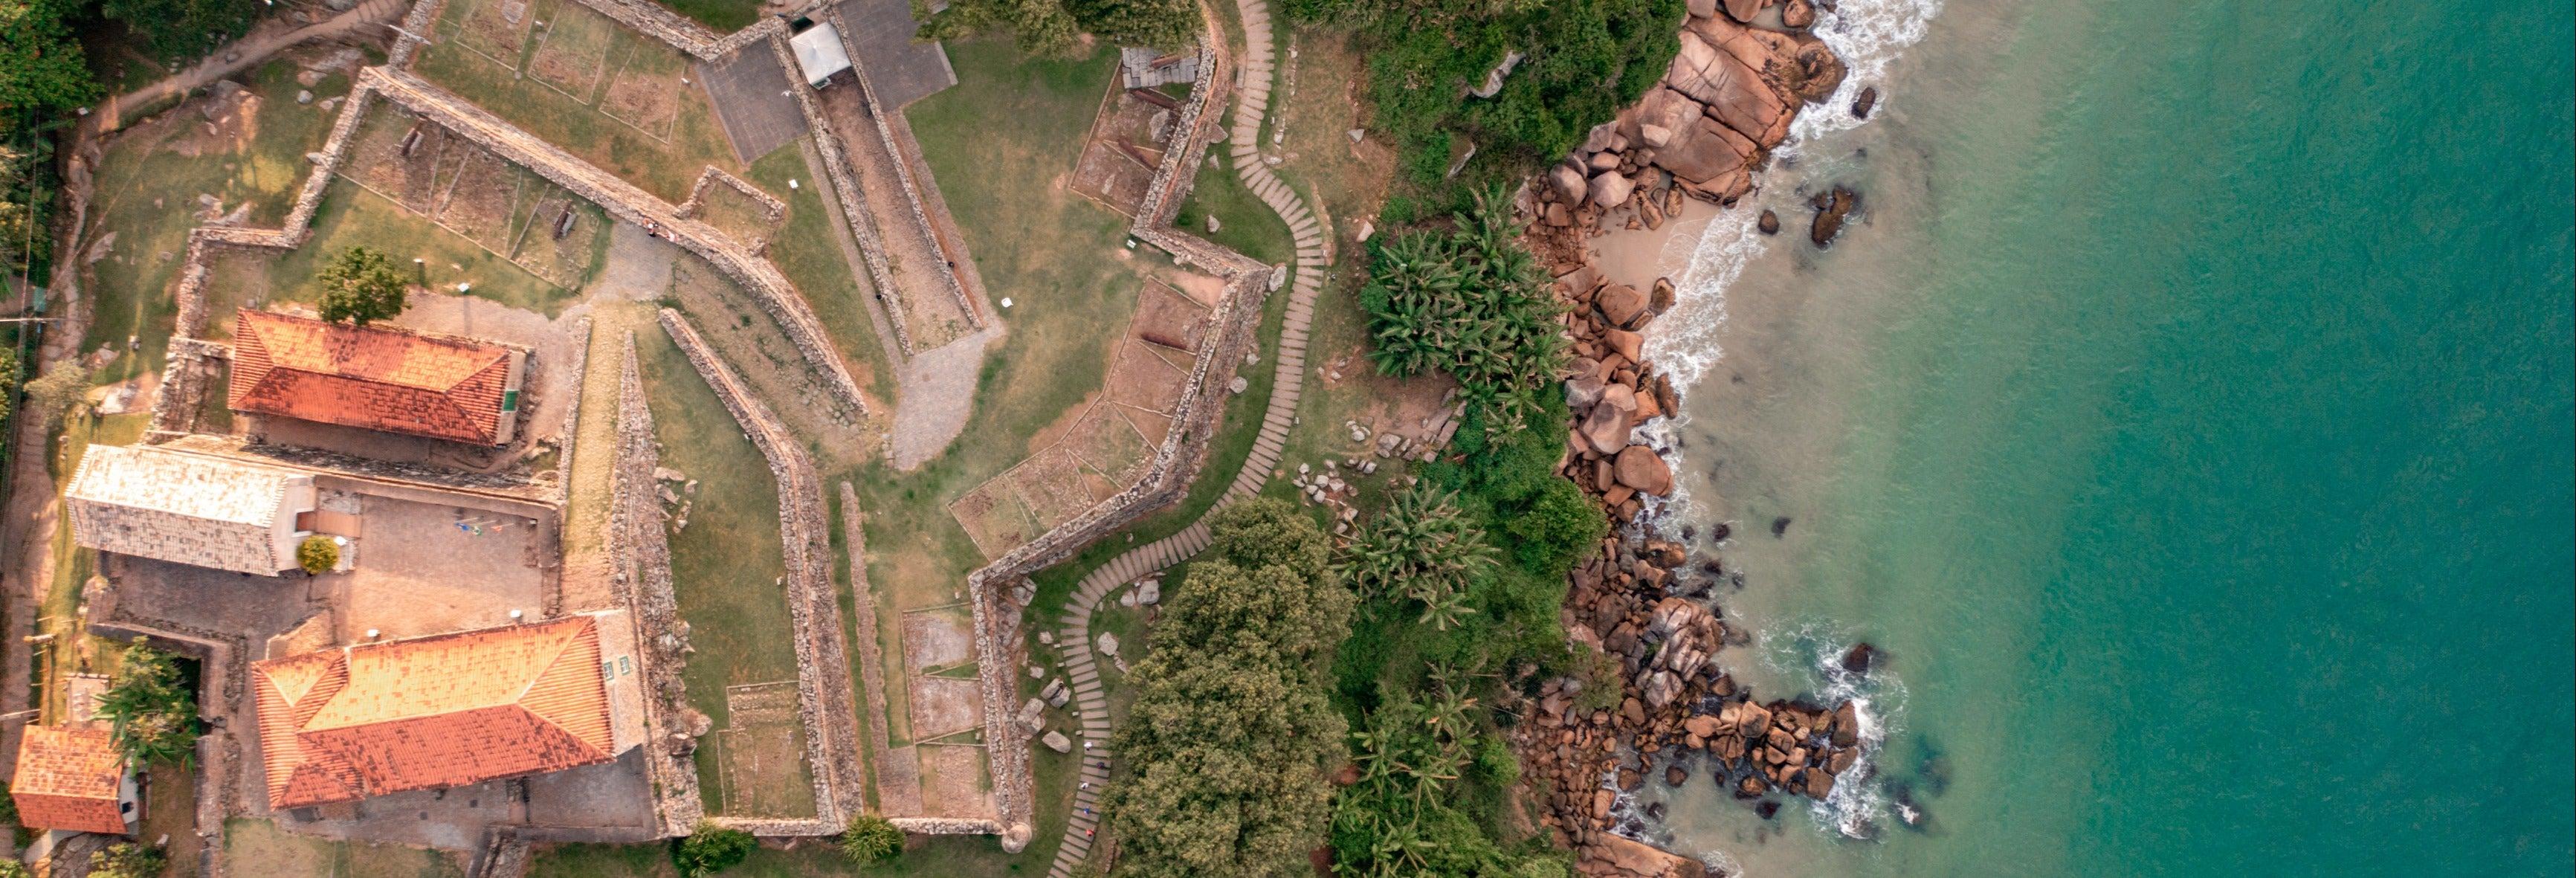 Snorkeling a Praia do Forte